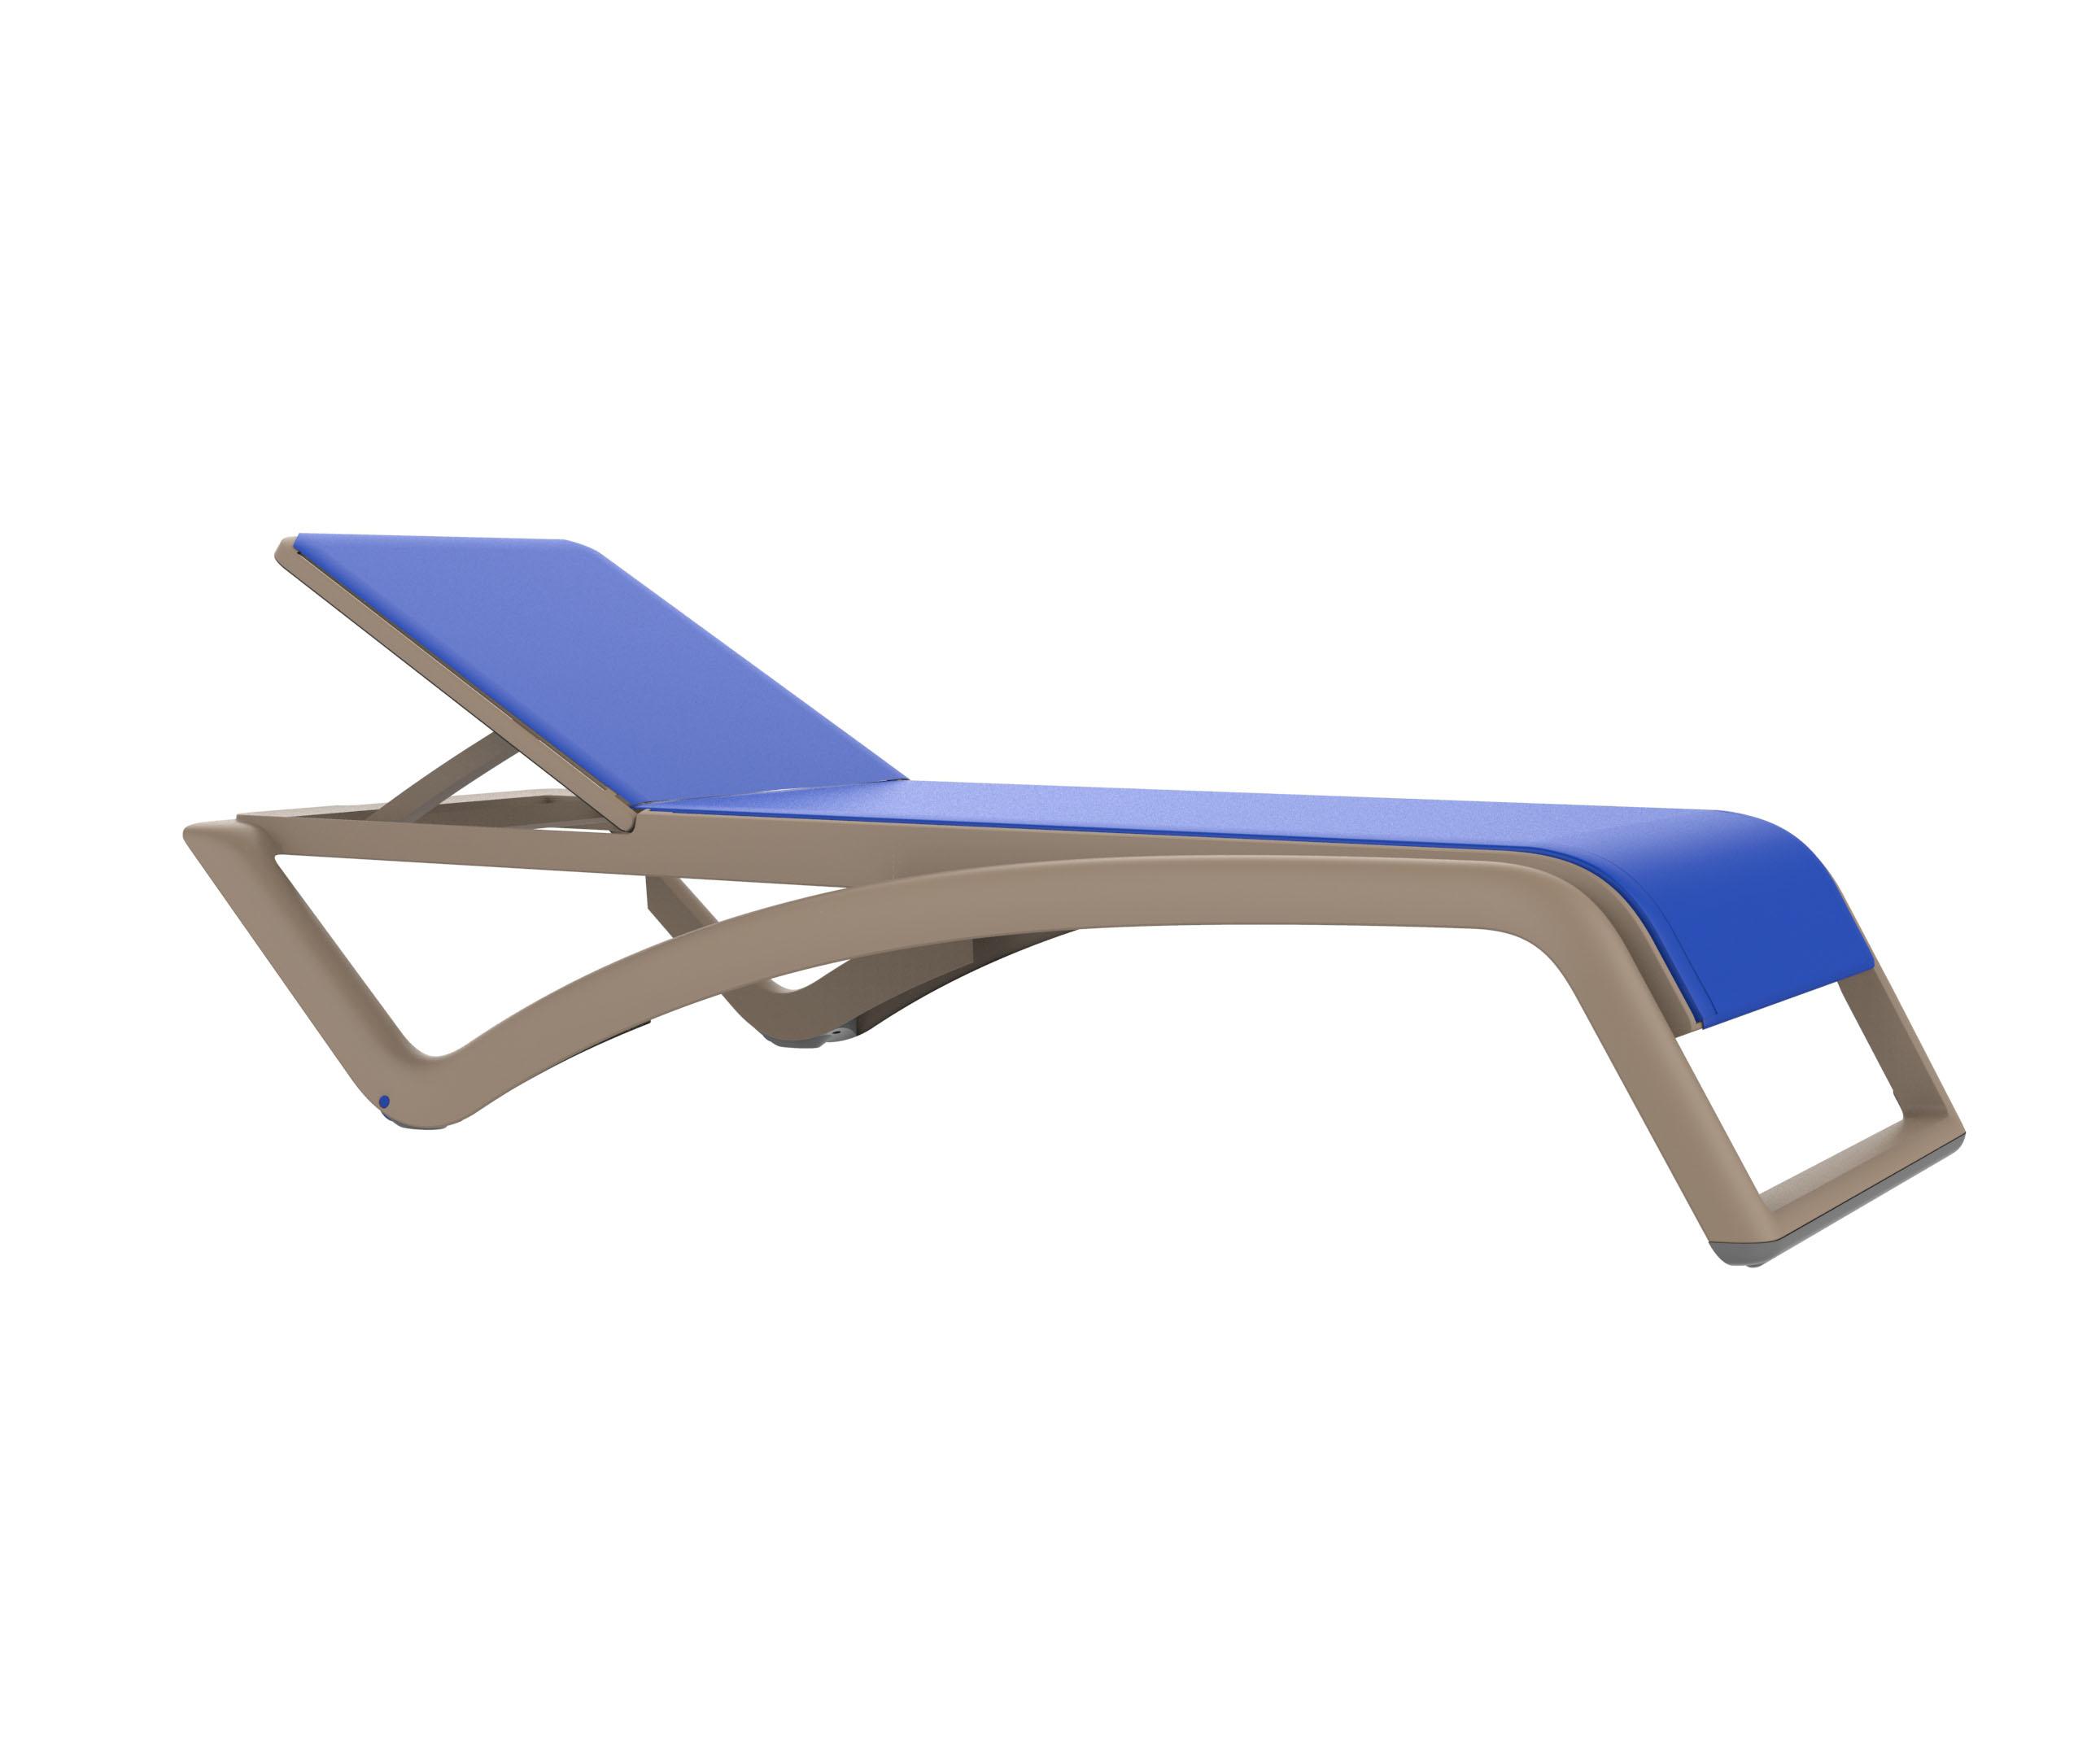 designerski leżak basenowy sky resol